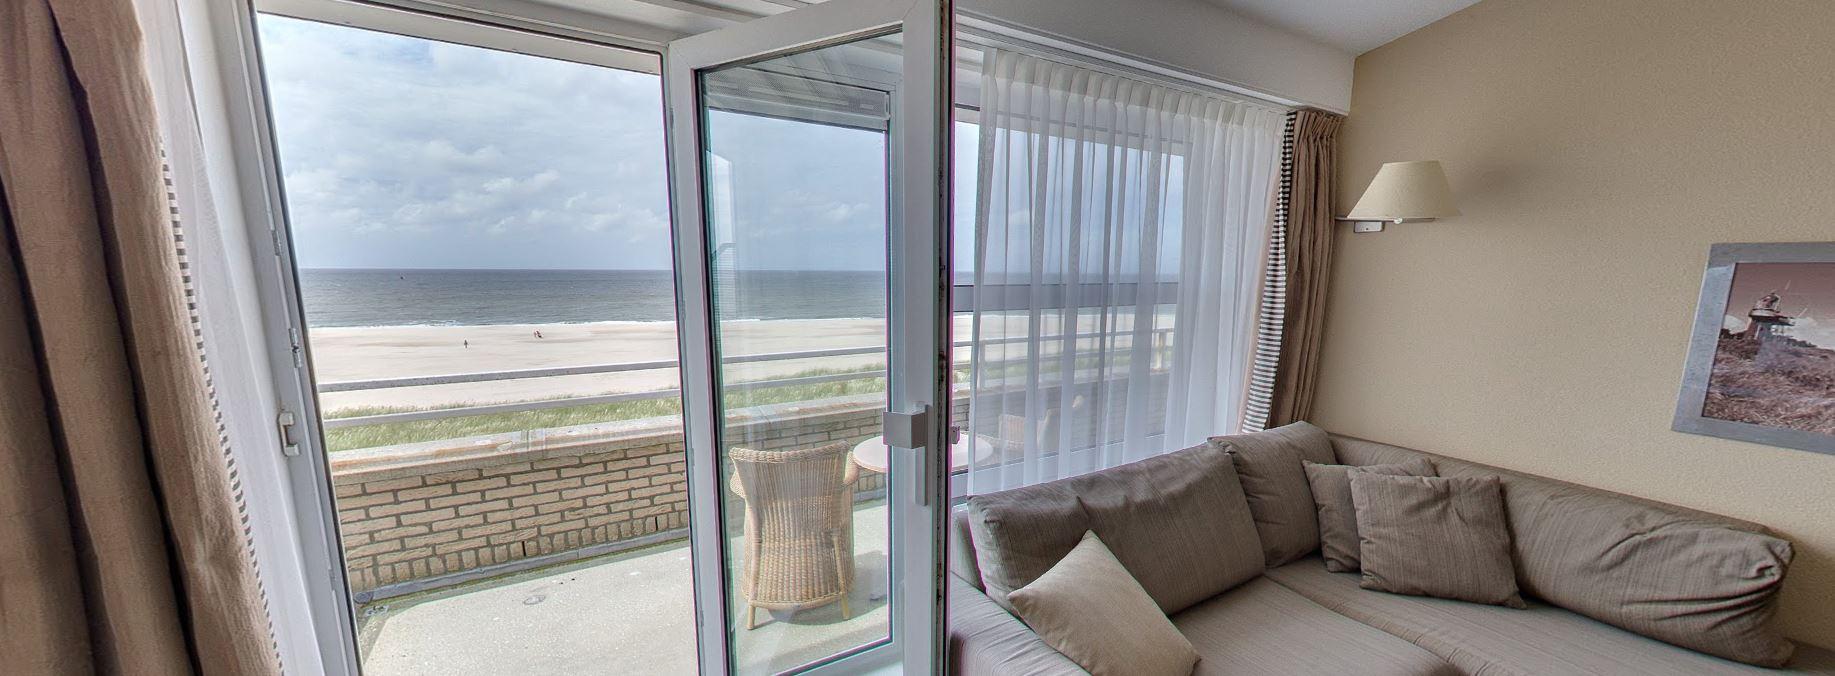 virtual-tour-westcord-strandhotel-seeduyn